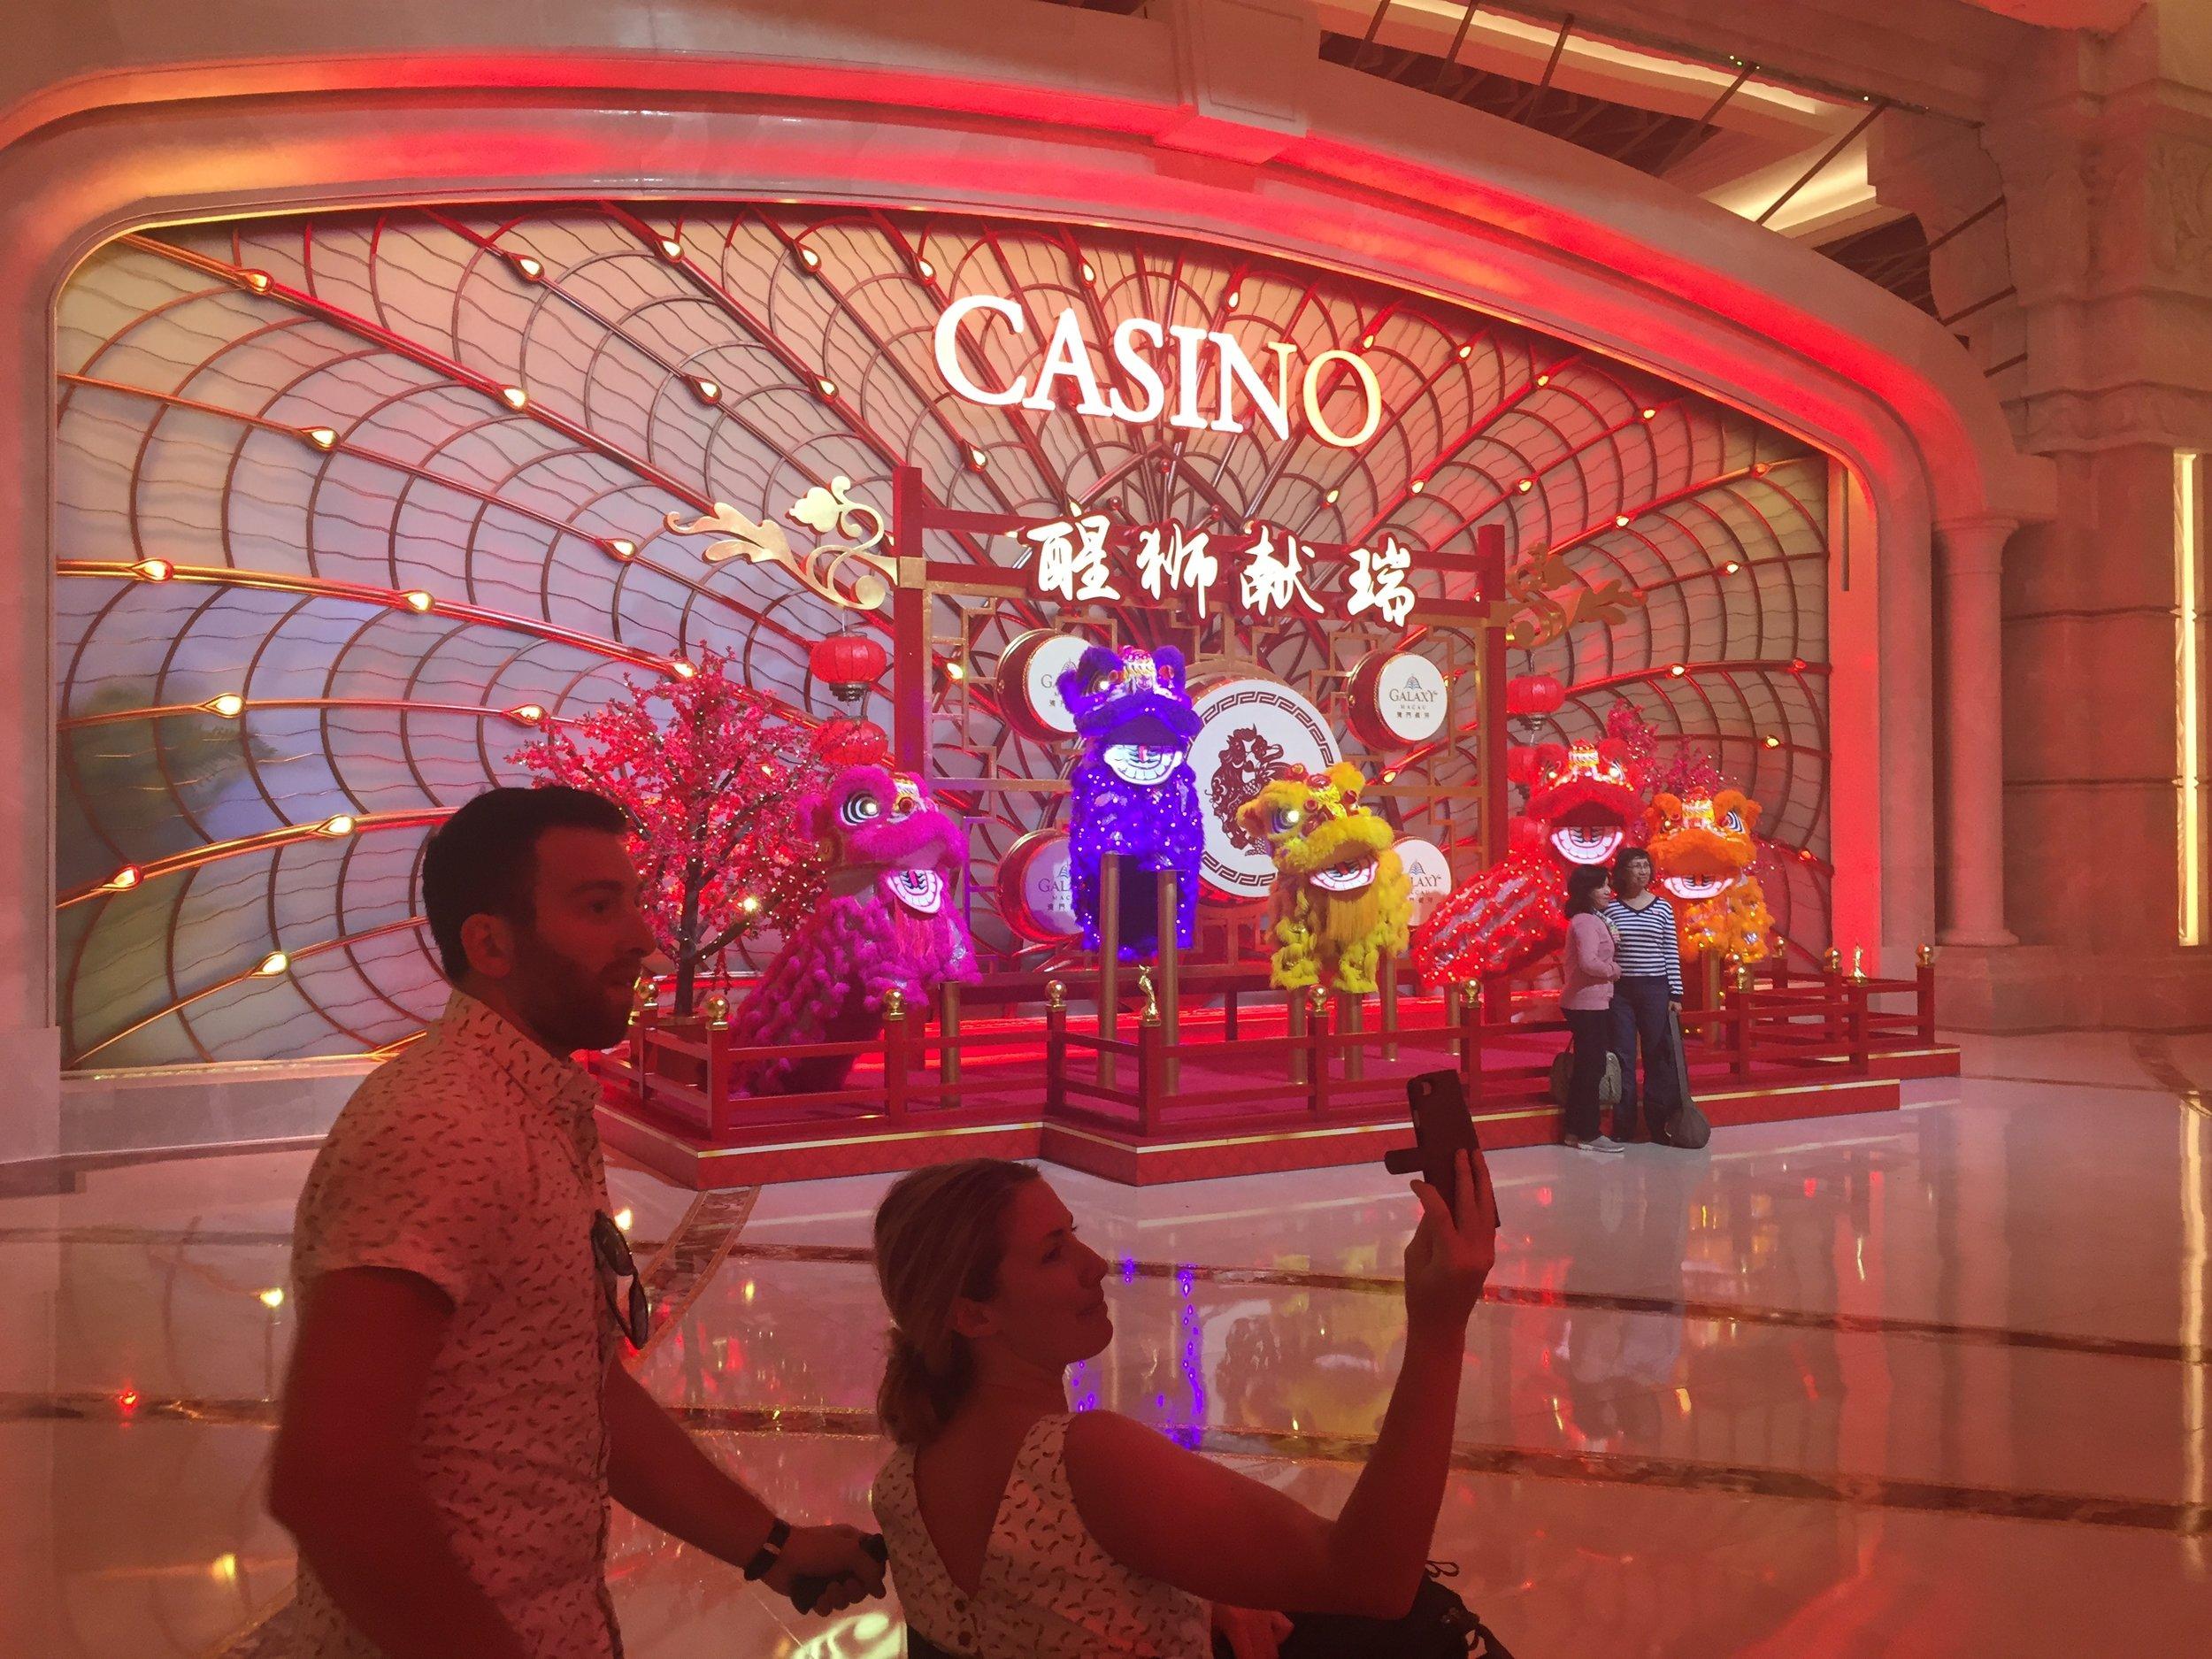 Dan and Sarah taking in all the splendor of The Galaxy Casino in Macau.